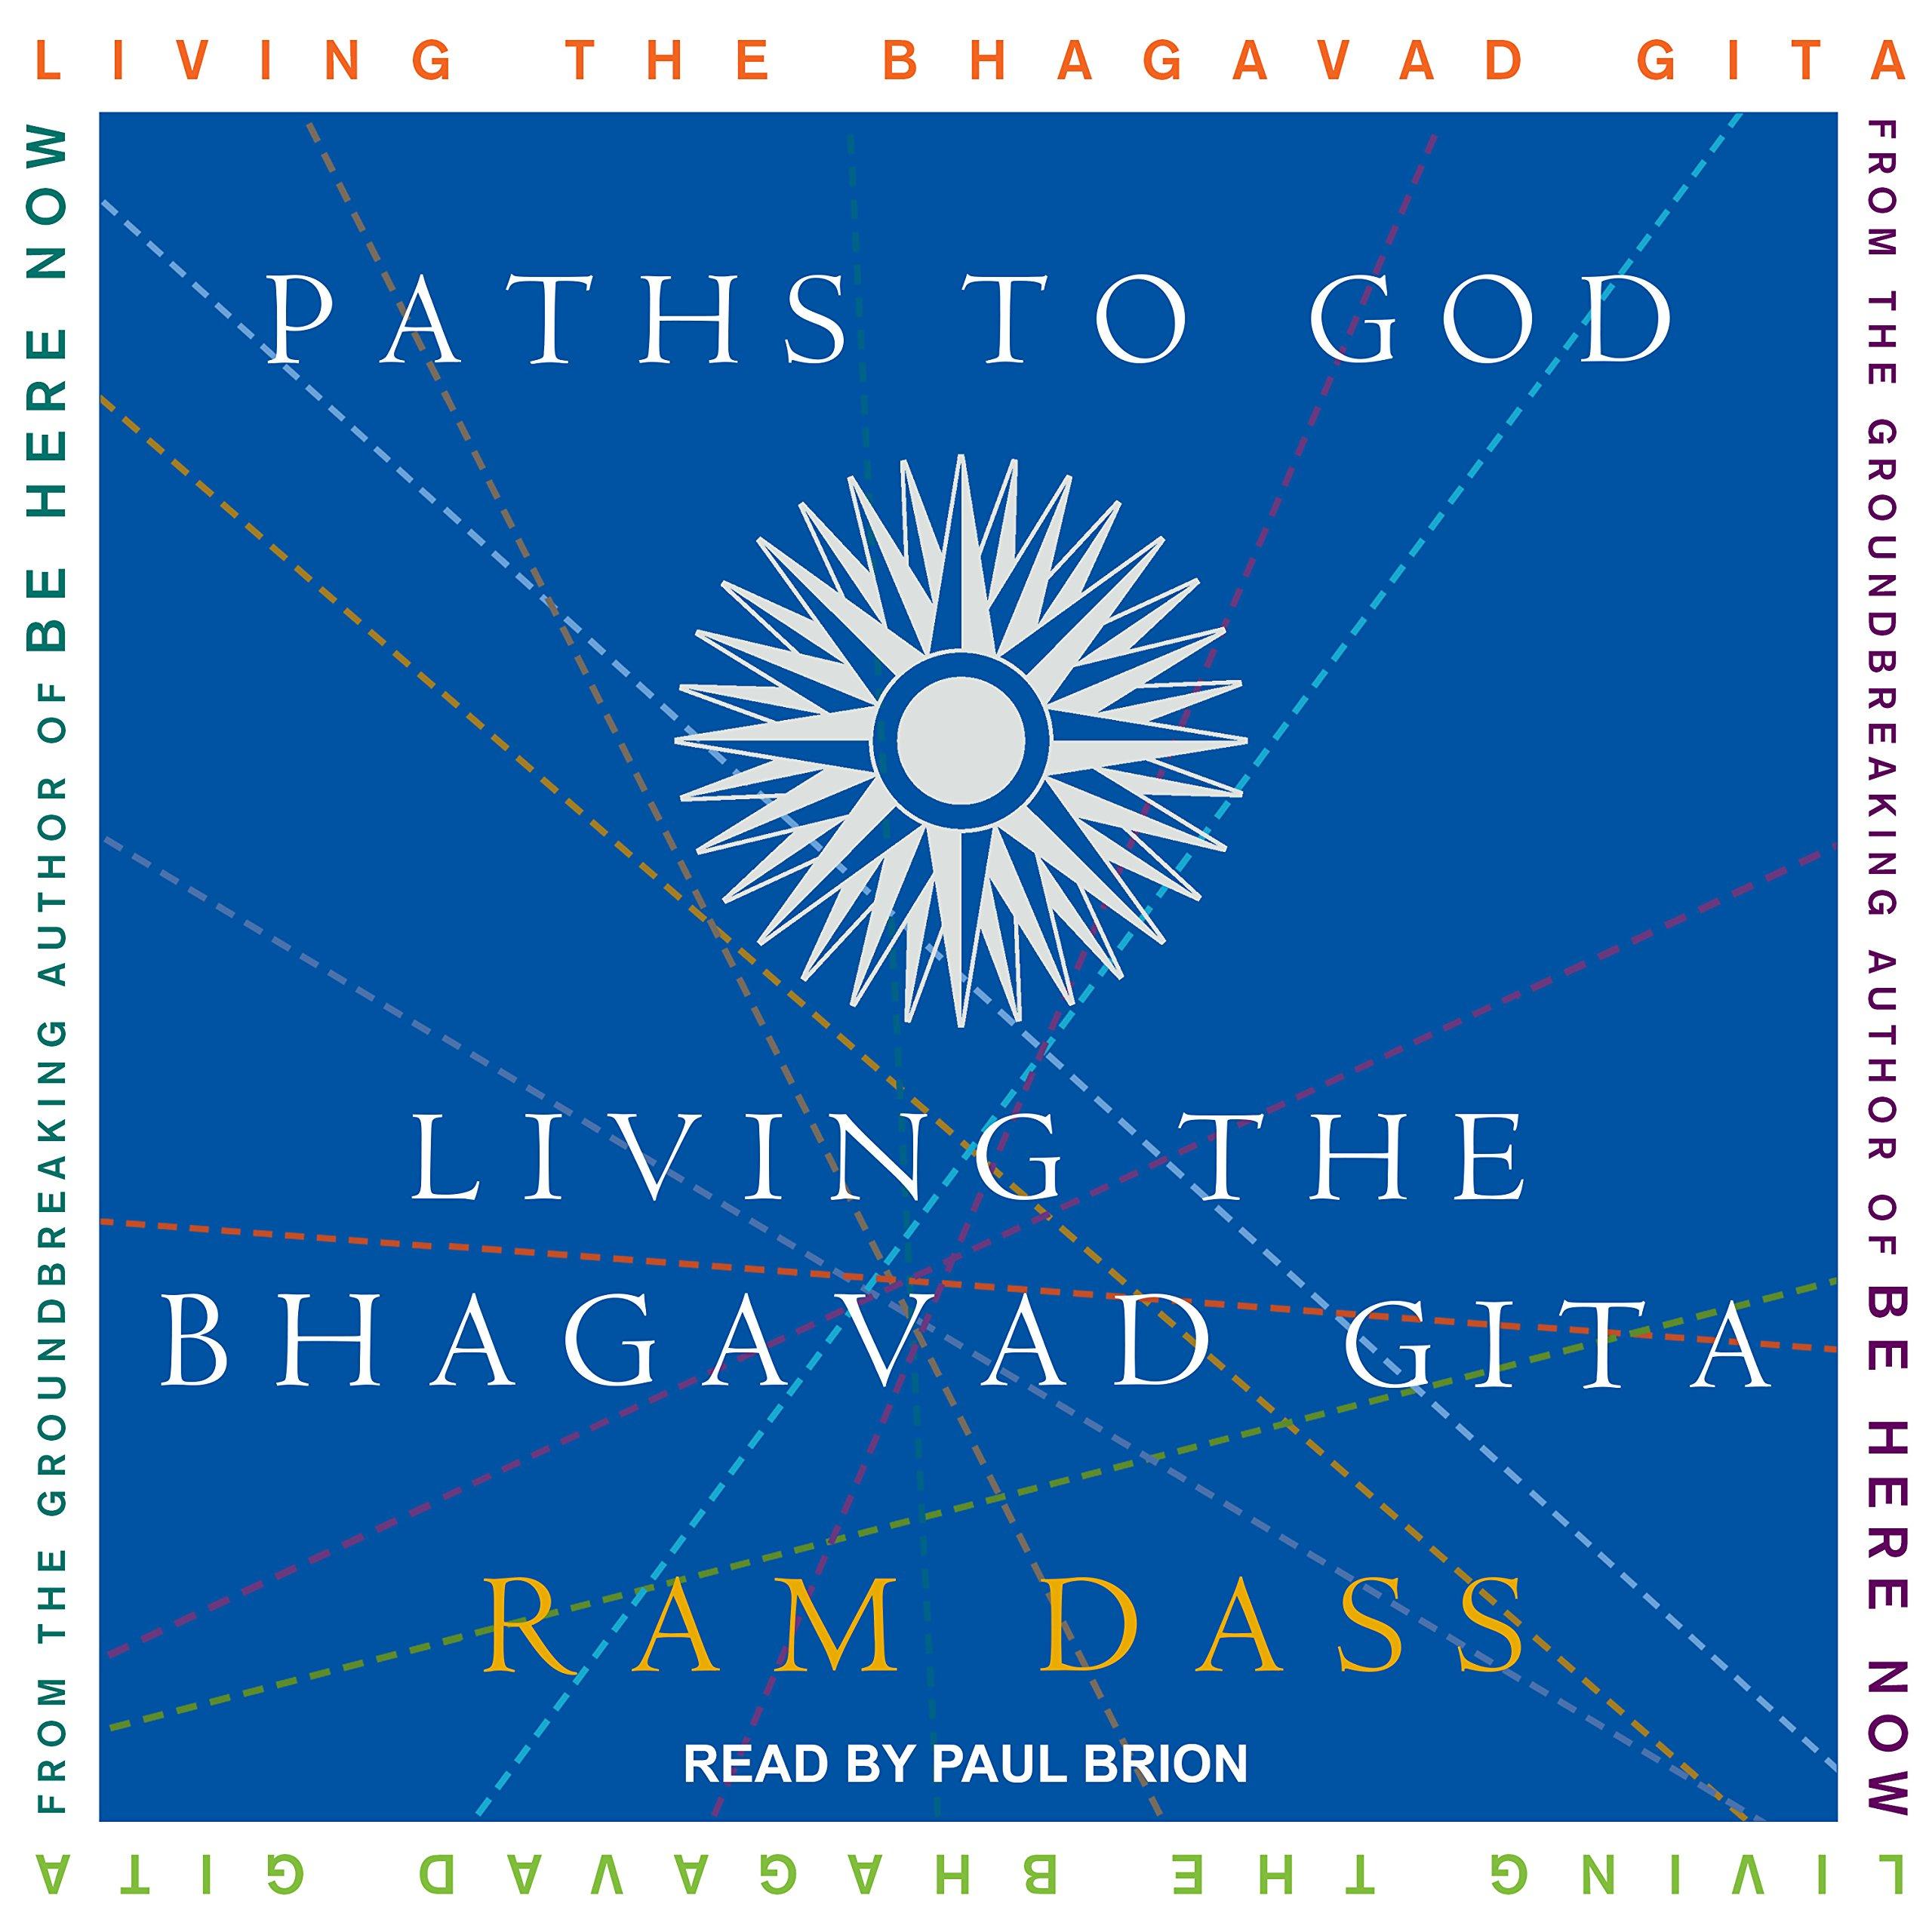 Paths to God Living the Bhagavad Gita Ram Dass Paul Brion